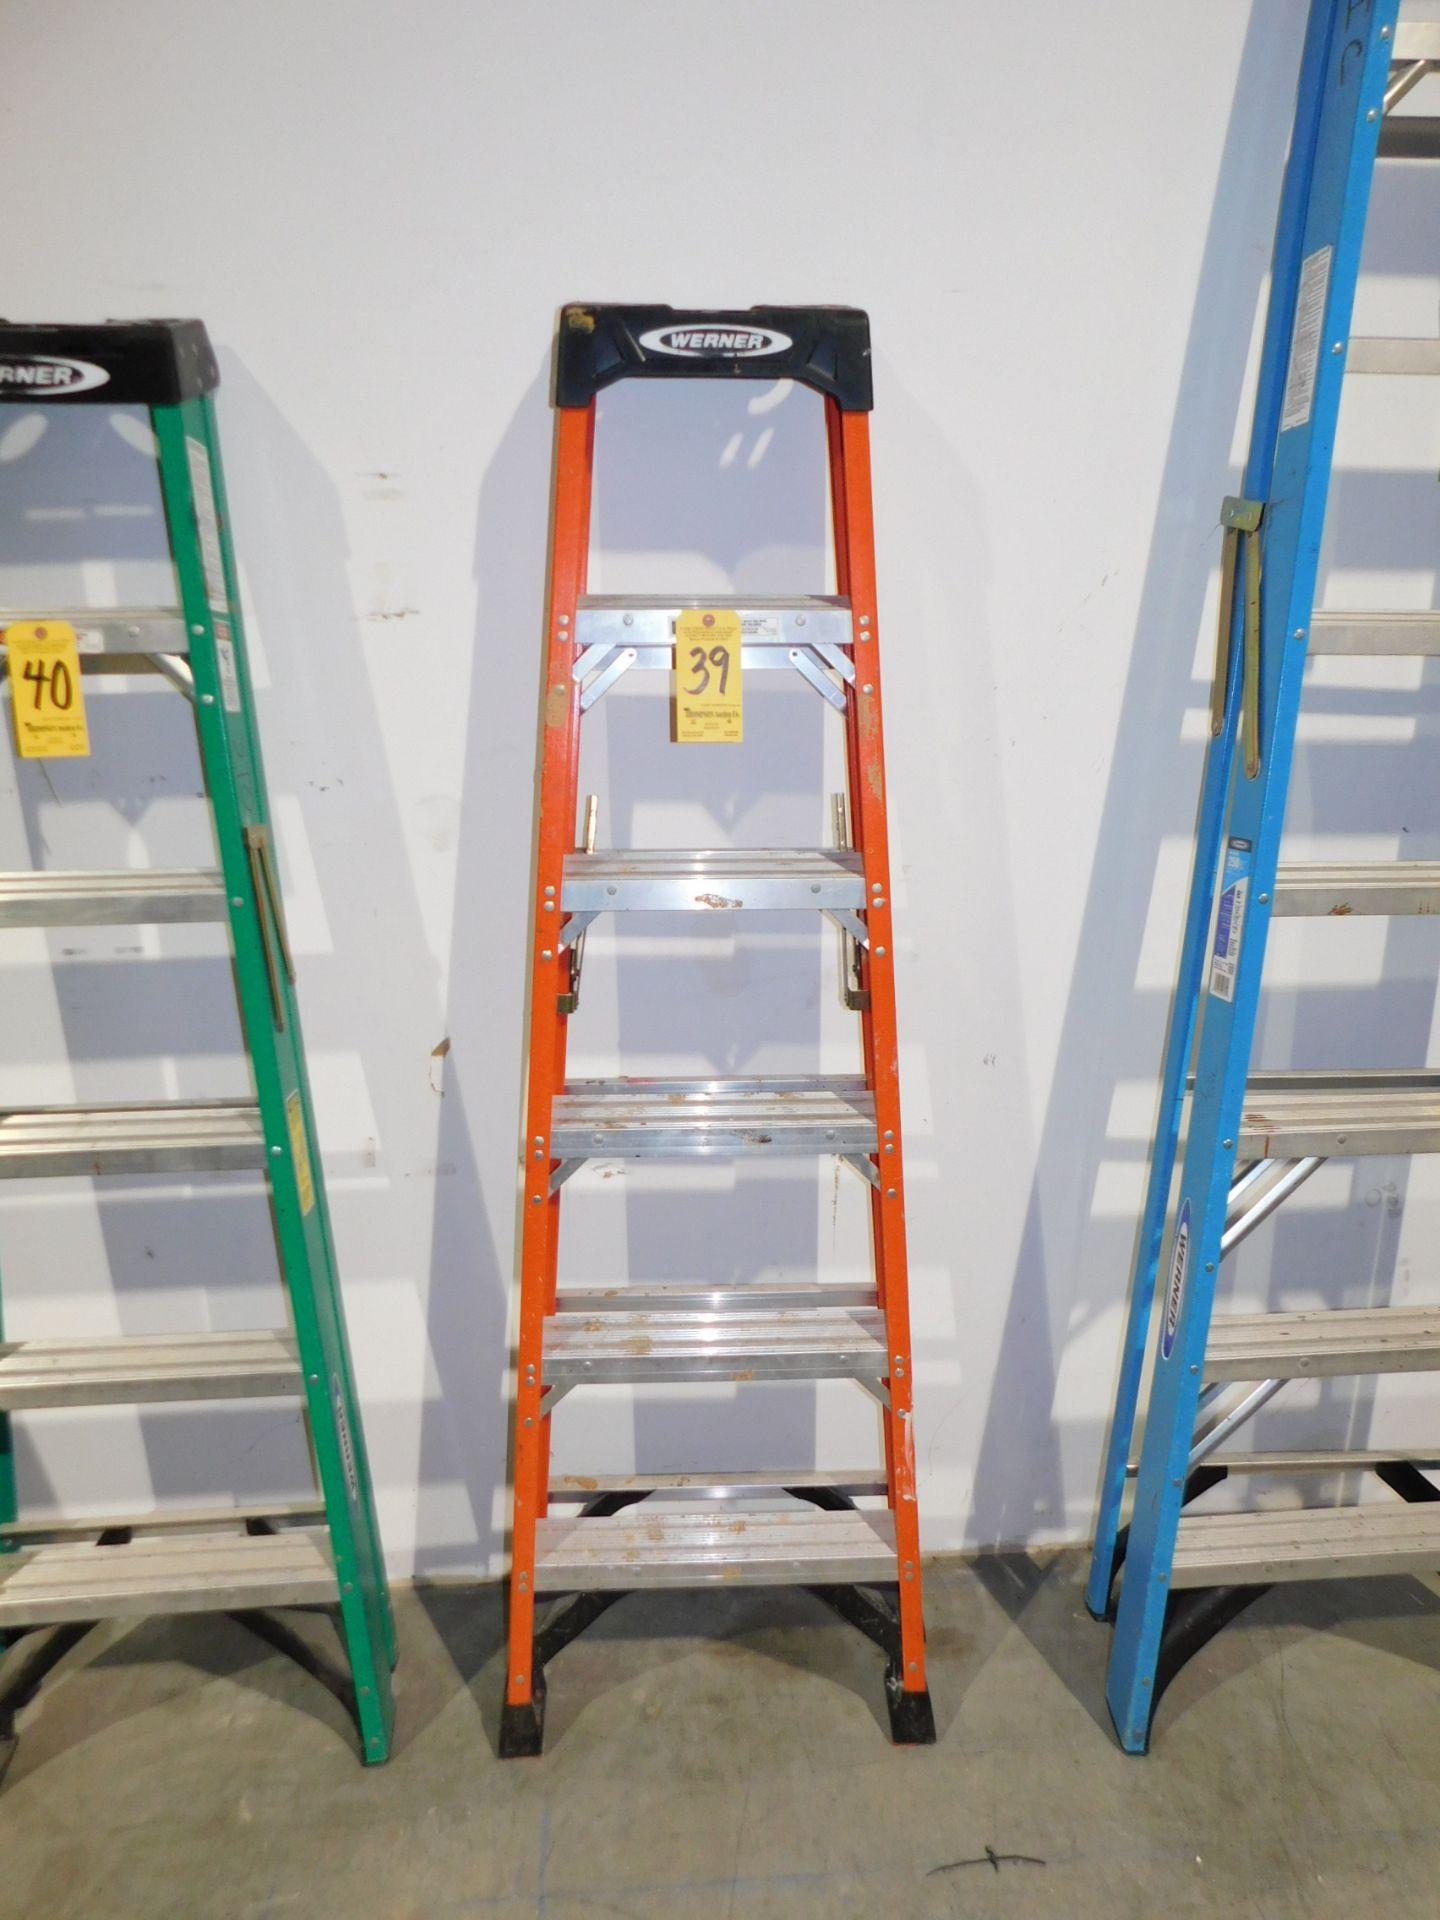 Lot 39 - Werner 6' Fiberglass Step Ladder